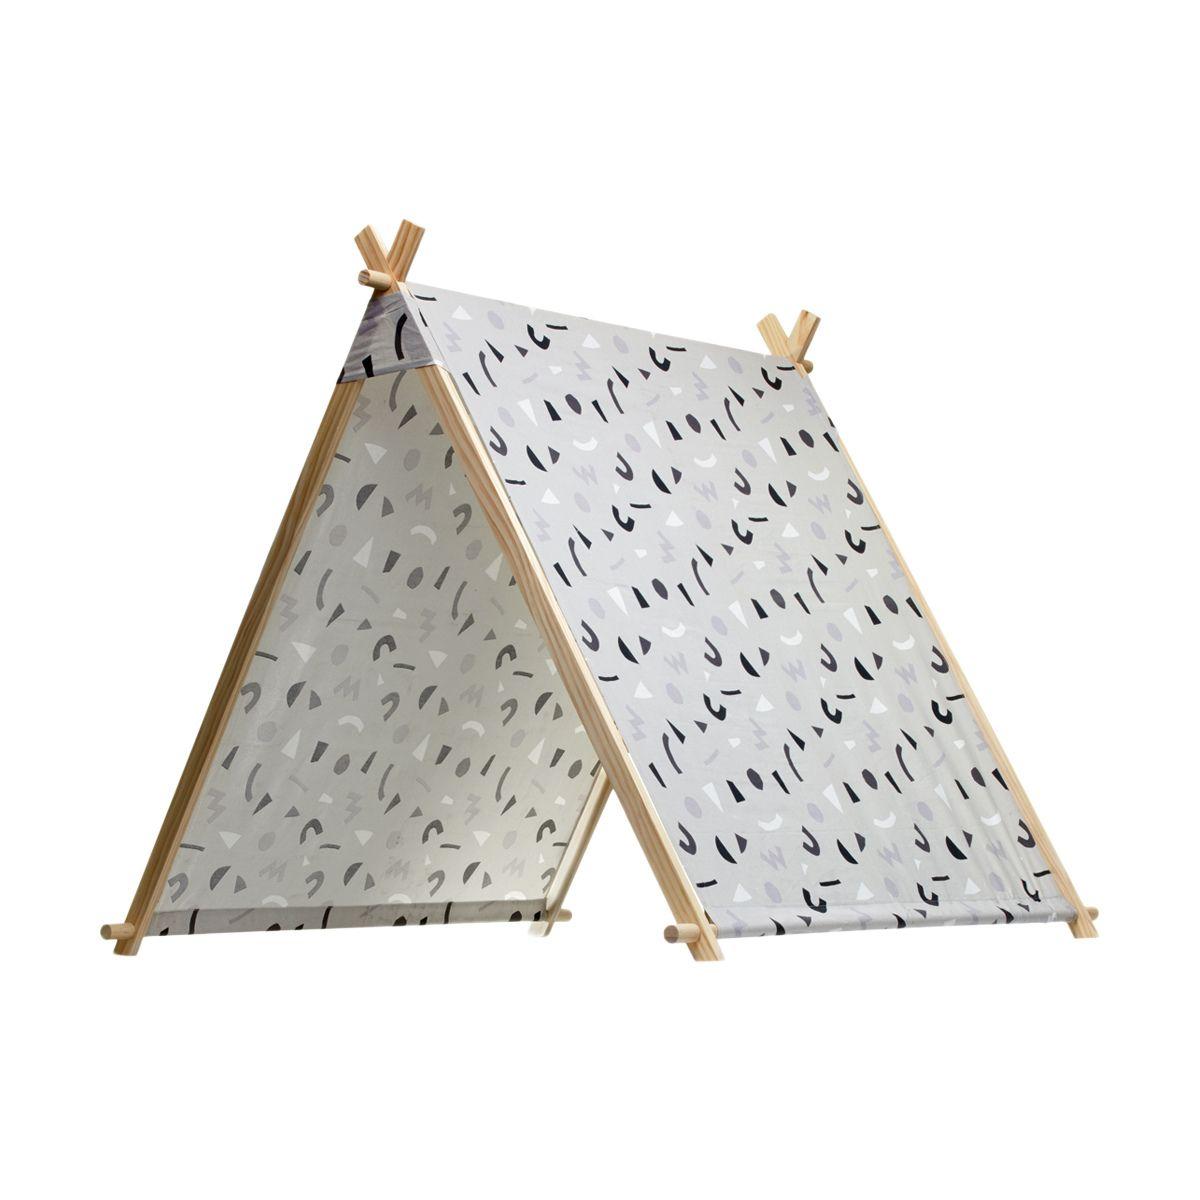 A Frame Play Tent | Kmart  sc 1 st  Pinterest & A Frame Play Tent | Kmart | wishlist for the kids | Pinterest ...